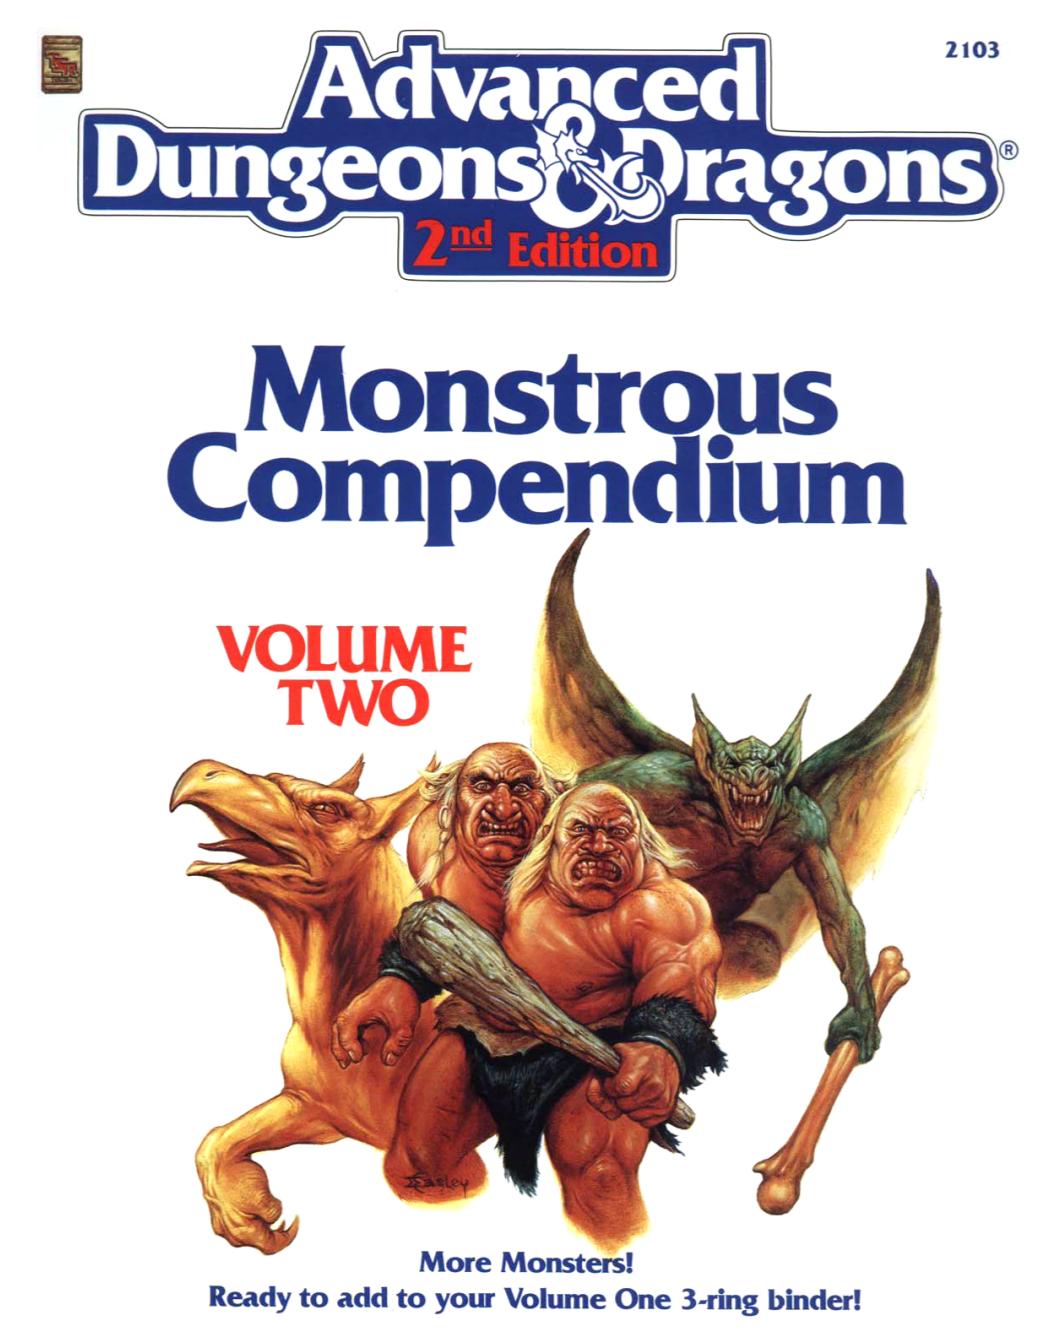 Monstrous Compendium Volume Two